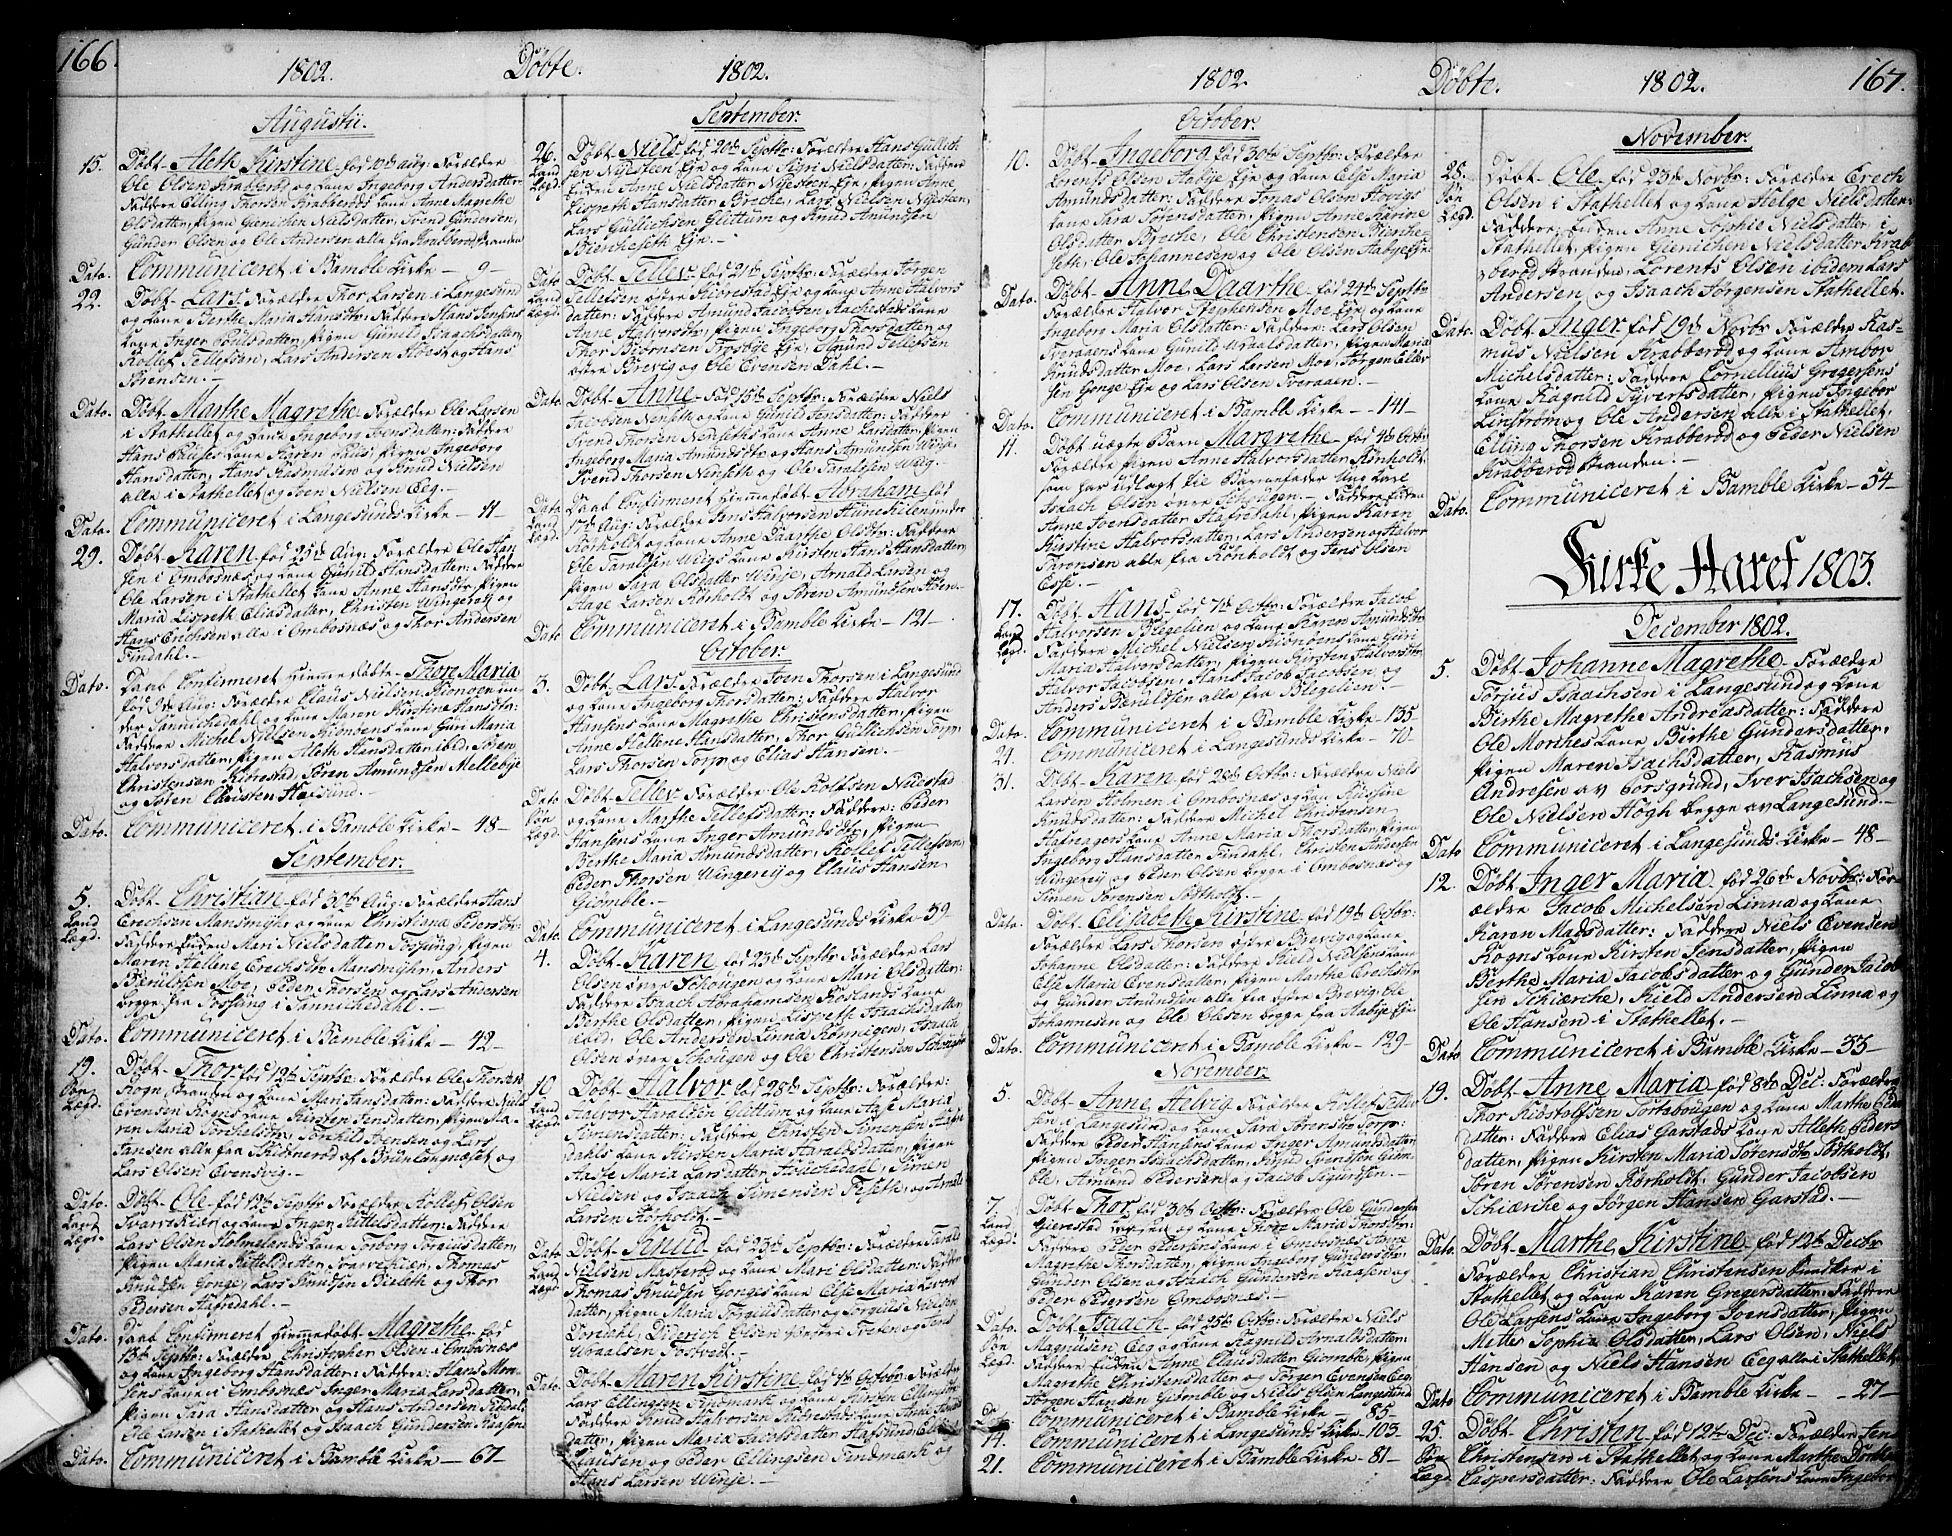 SAKO, Bamble kirkebøker, F/Fa/L0002: Ministerialbok nr. I 2, 1775-1814, s. 166-167